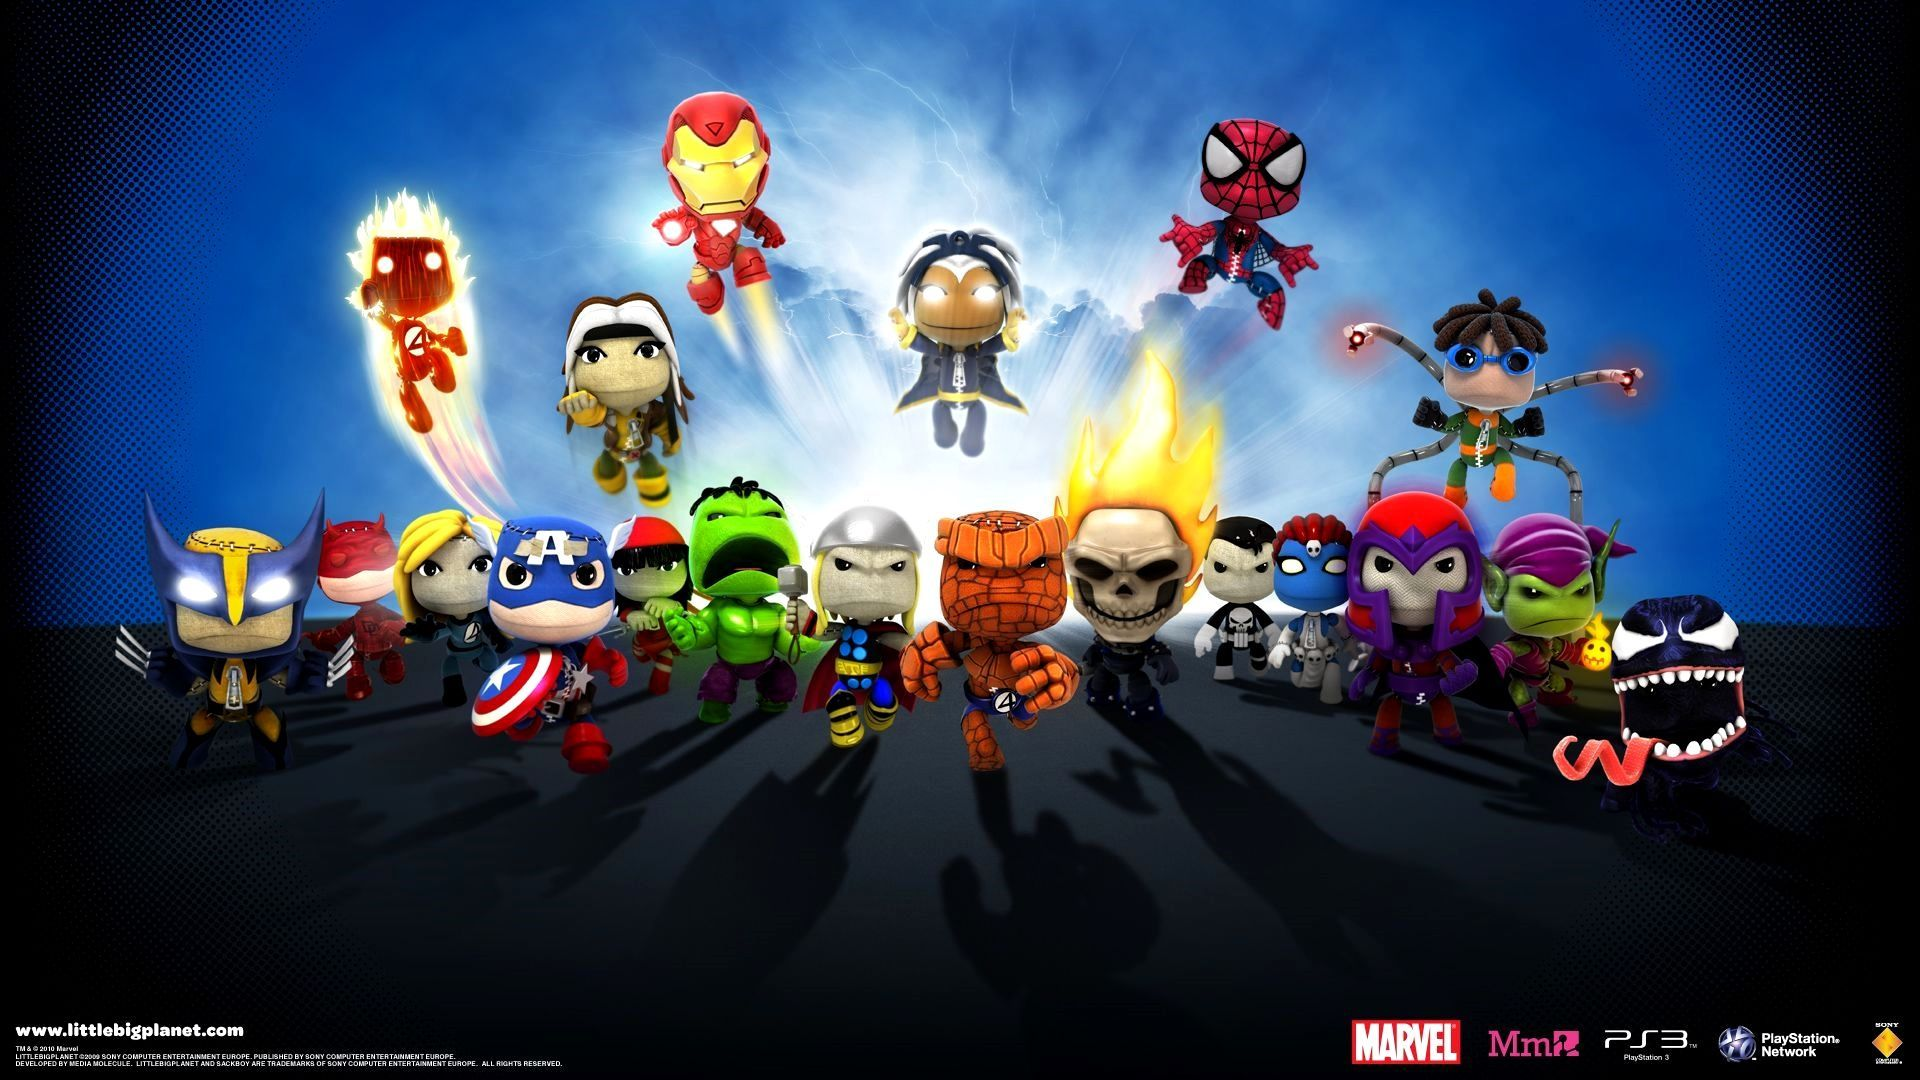 4k Wallpaper For Pc Cartoons Ideas 4k In 2020 Avengers Wallpaper Superhero Wallpaper Hd Superhero Wallpaper